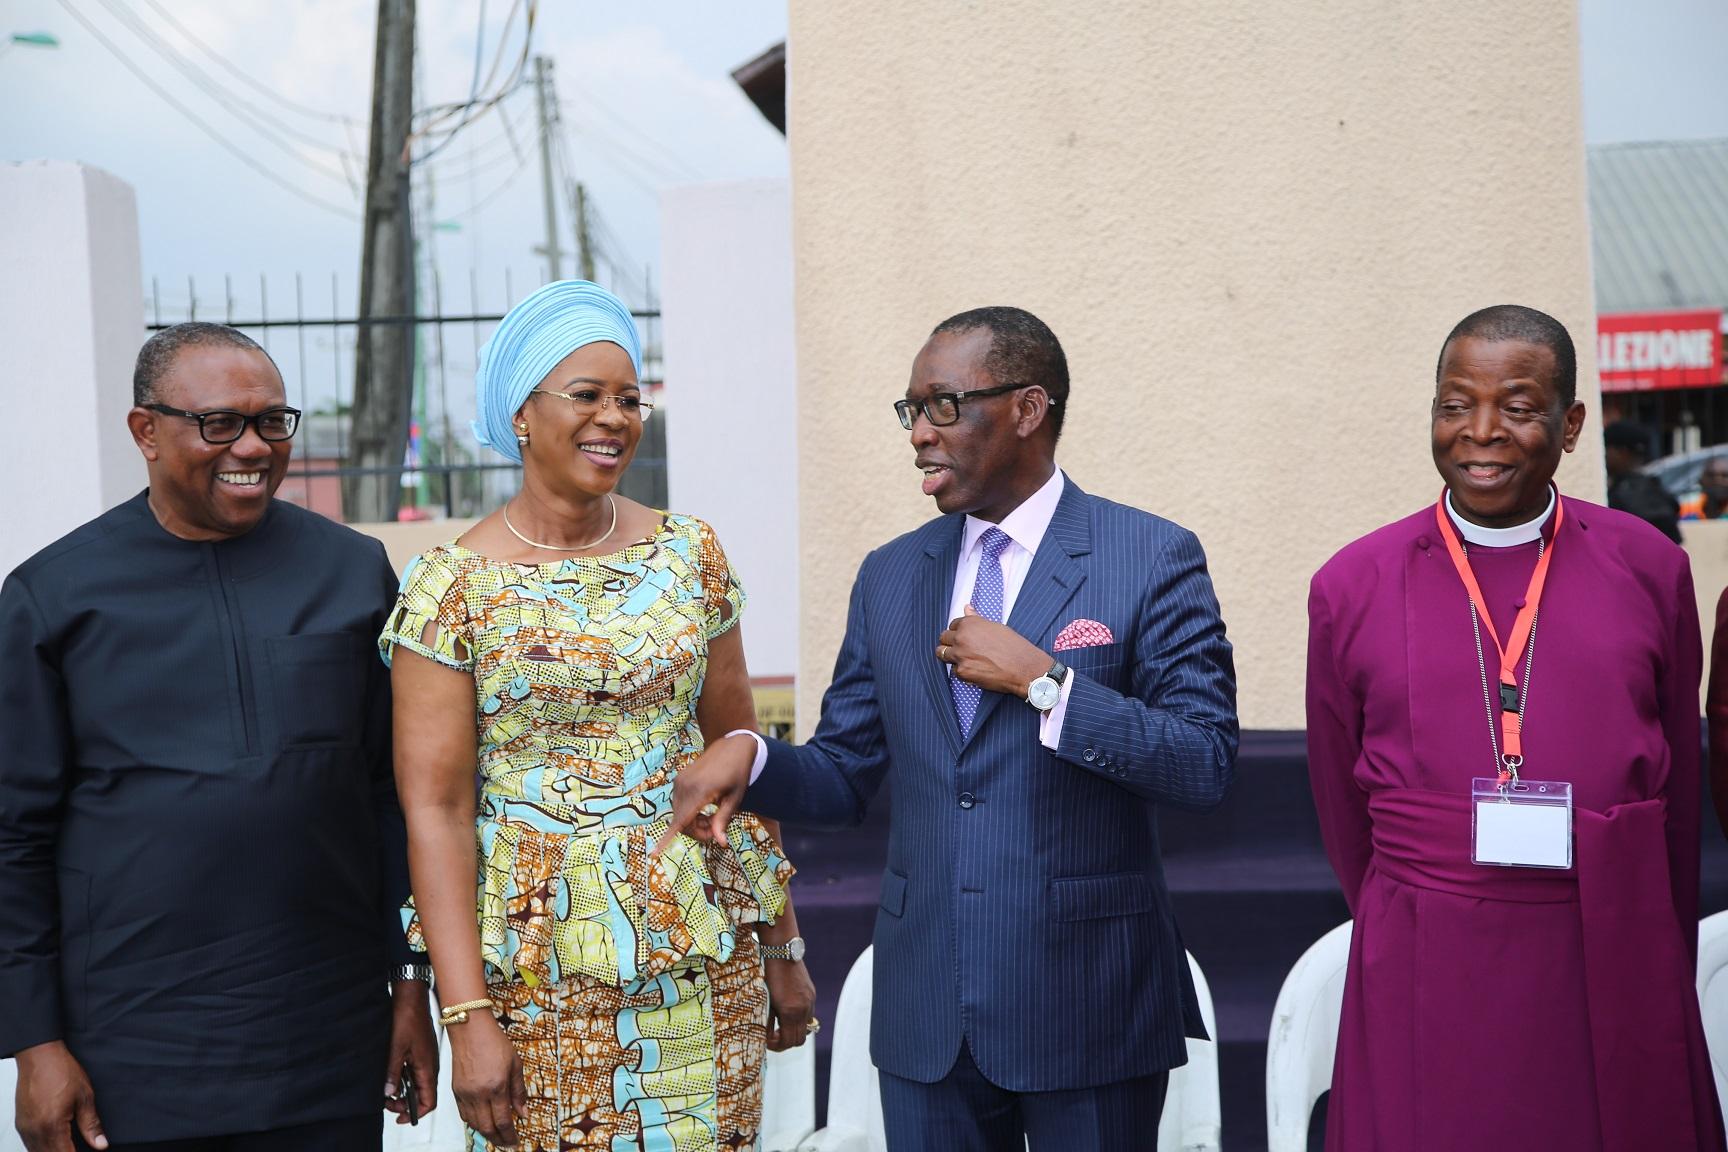 Primate, Obi, Okowa call for credible elections